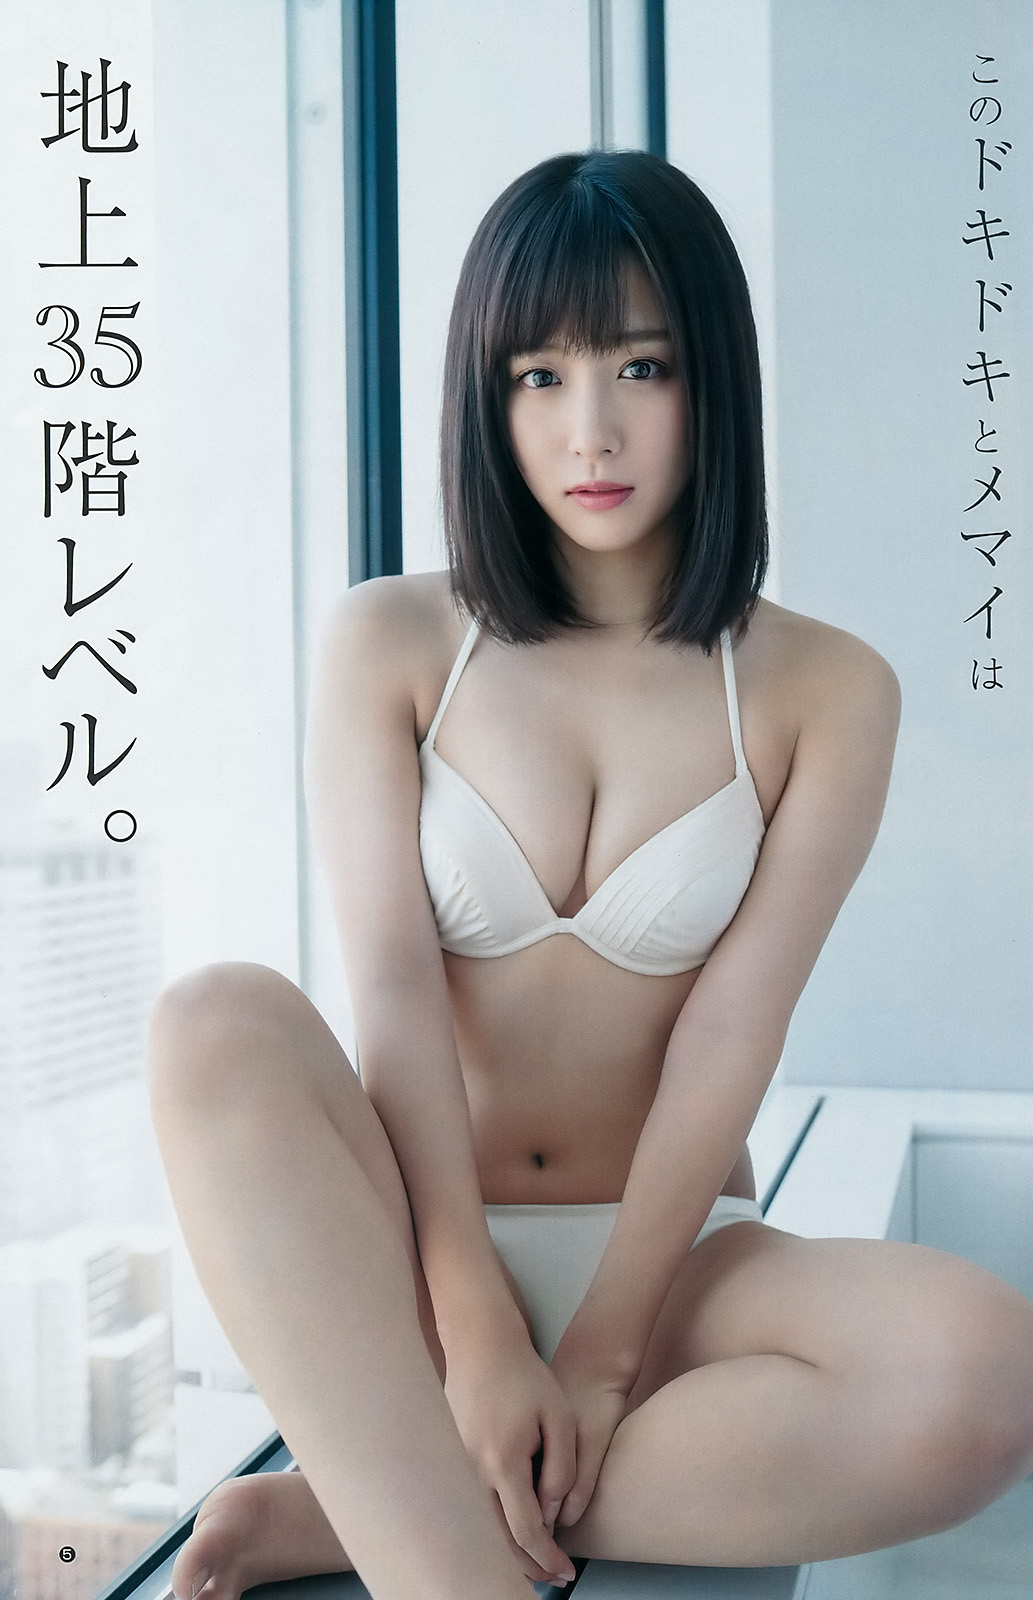 Kamata Natsuki Image 172279 Asiachan Kpop Image Board